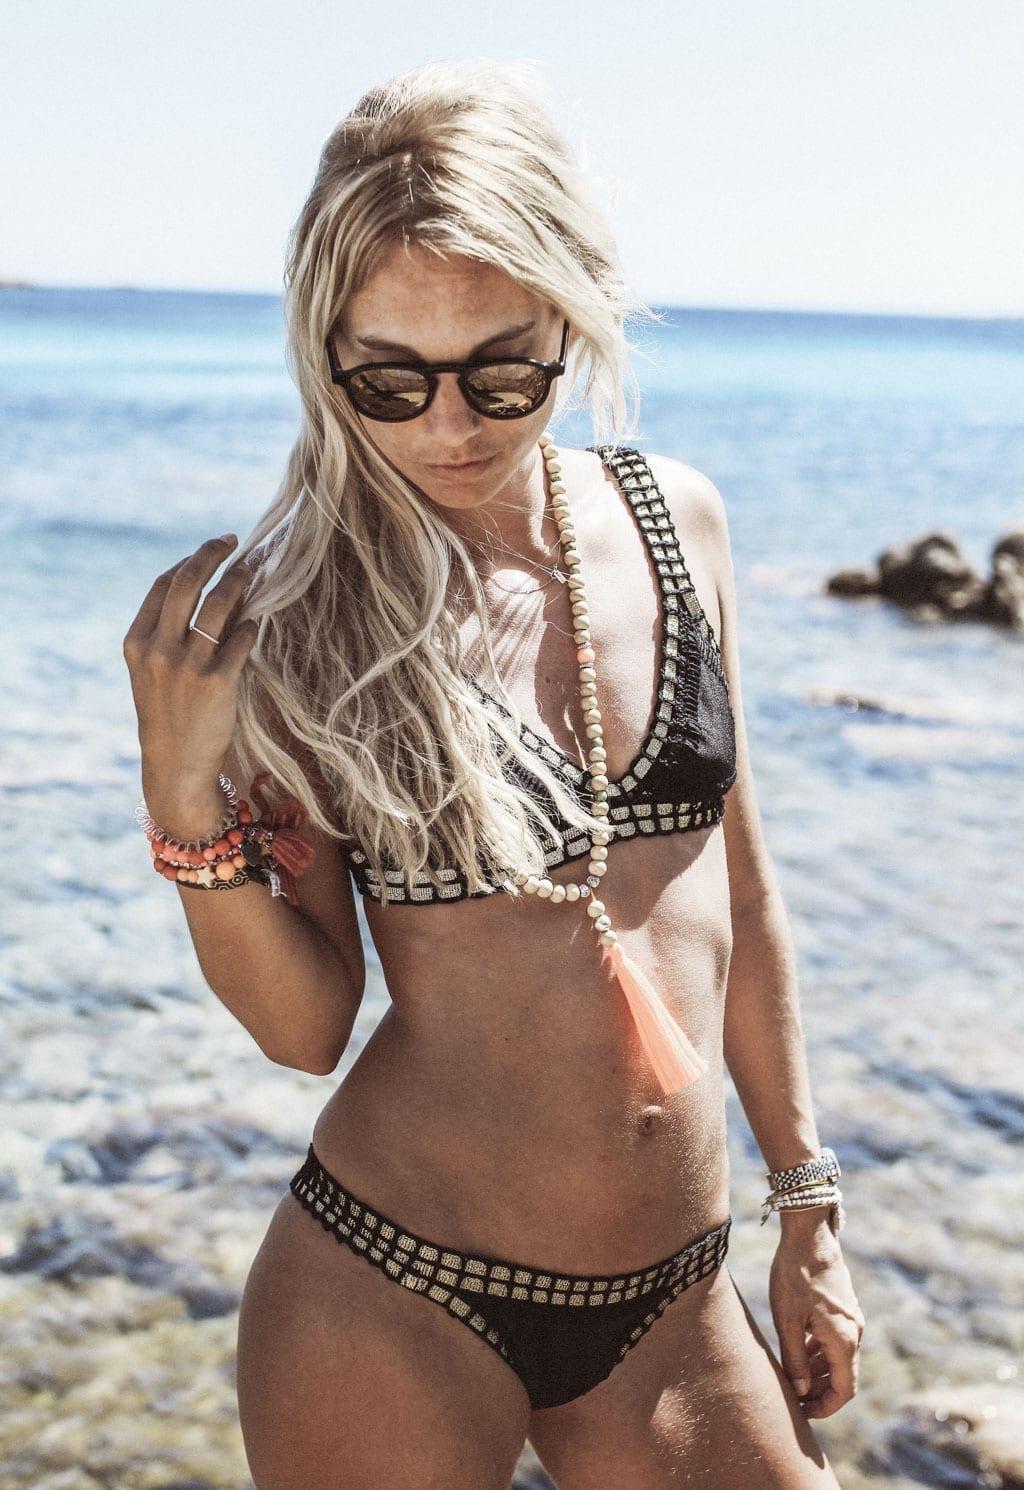 CK-1606_Sardinien-Sardegna-Sardinia-Italy-Italia-Fashion-Blog-Beach-Caribbean-Dress-Blonde-Karin-Kaswurm-Bikini-Kiini-9235